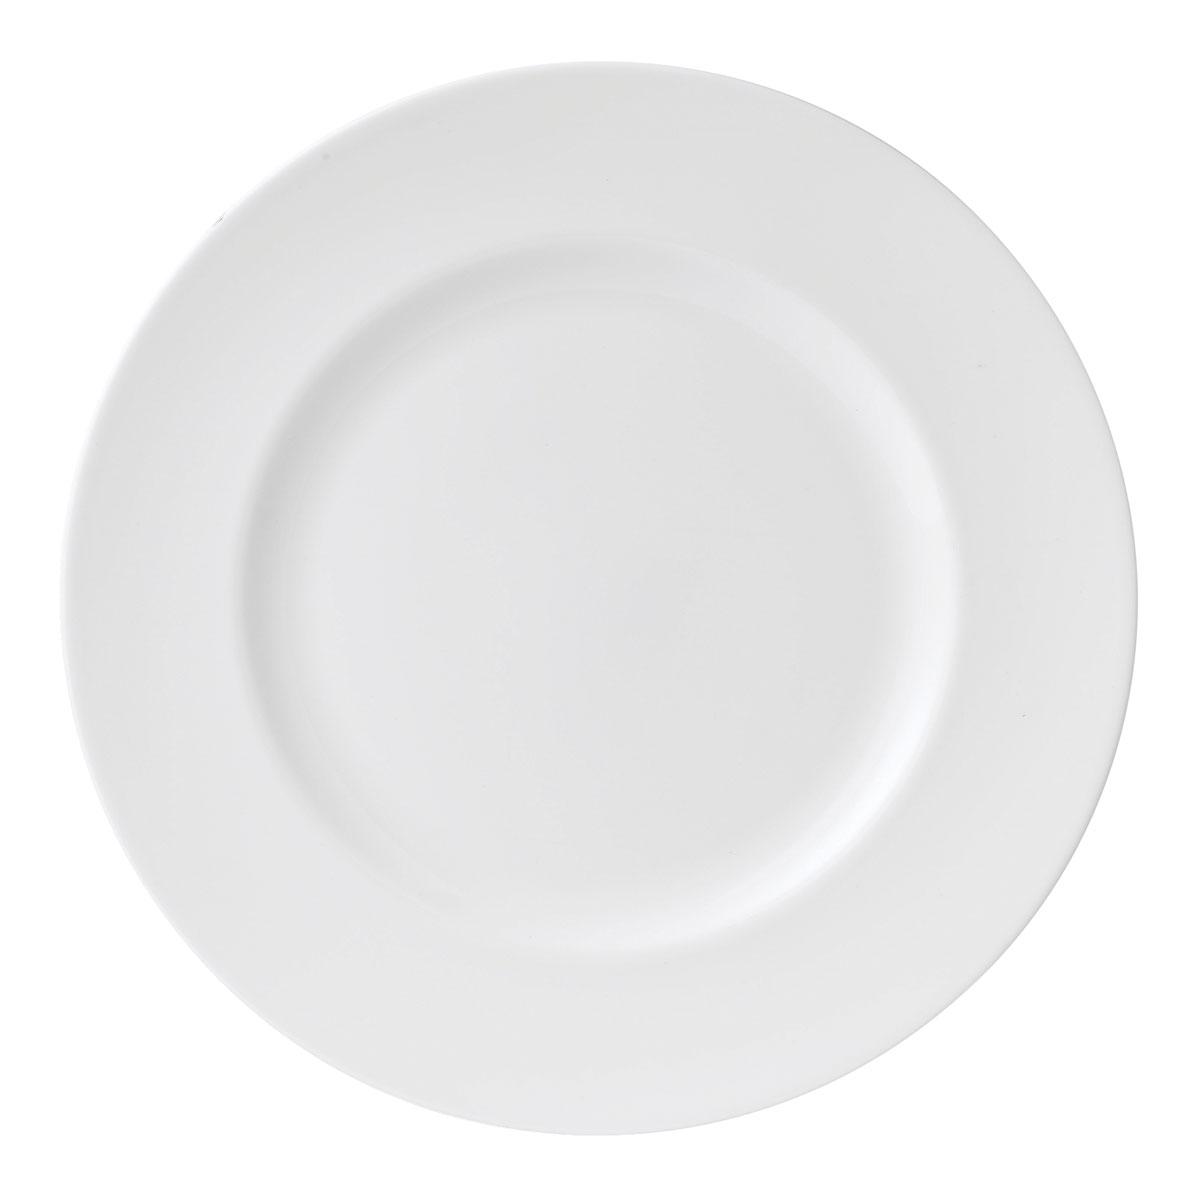 Wedgwood Wedgwood White Dinner Plate, single